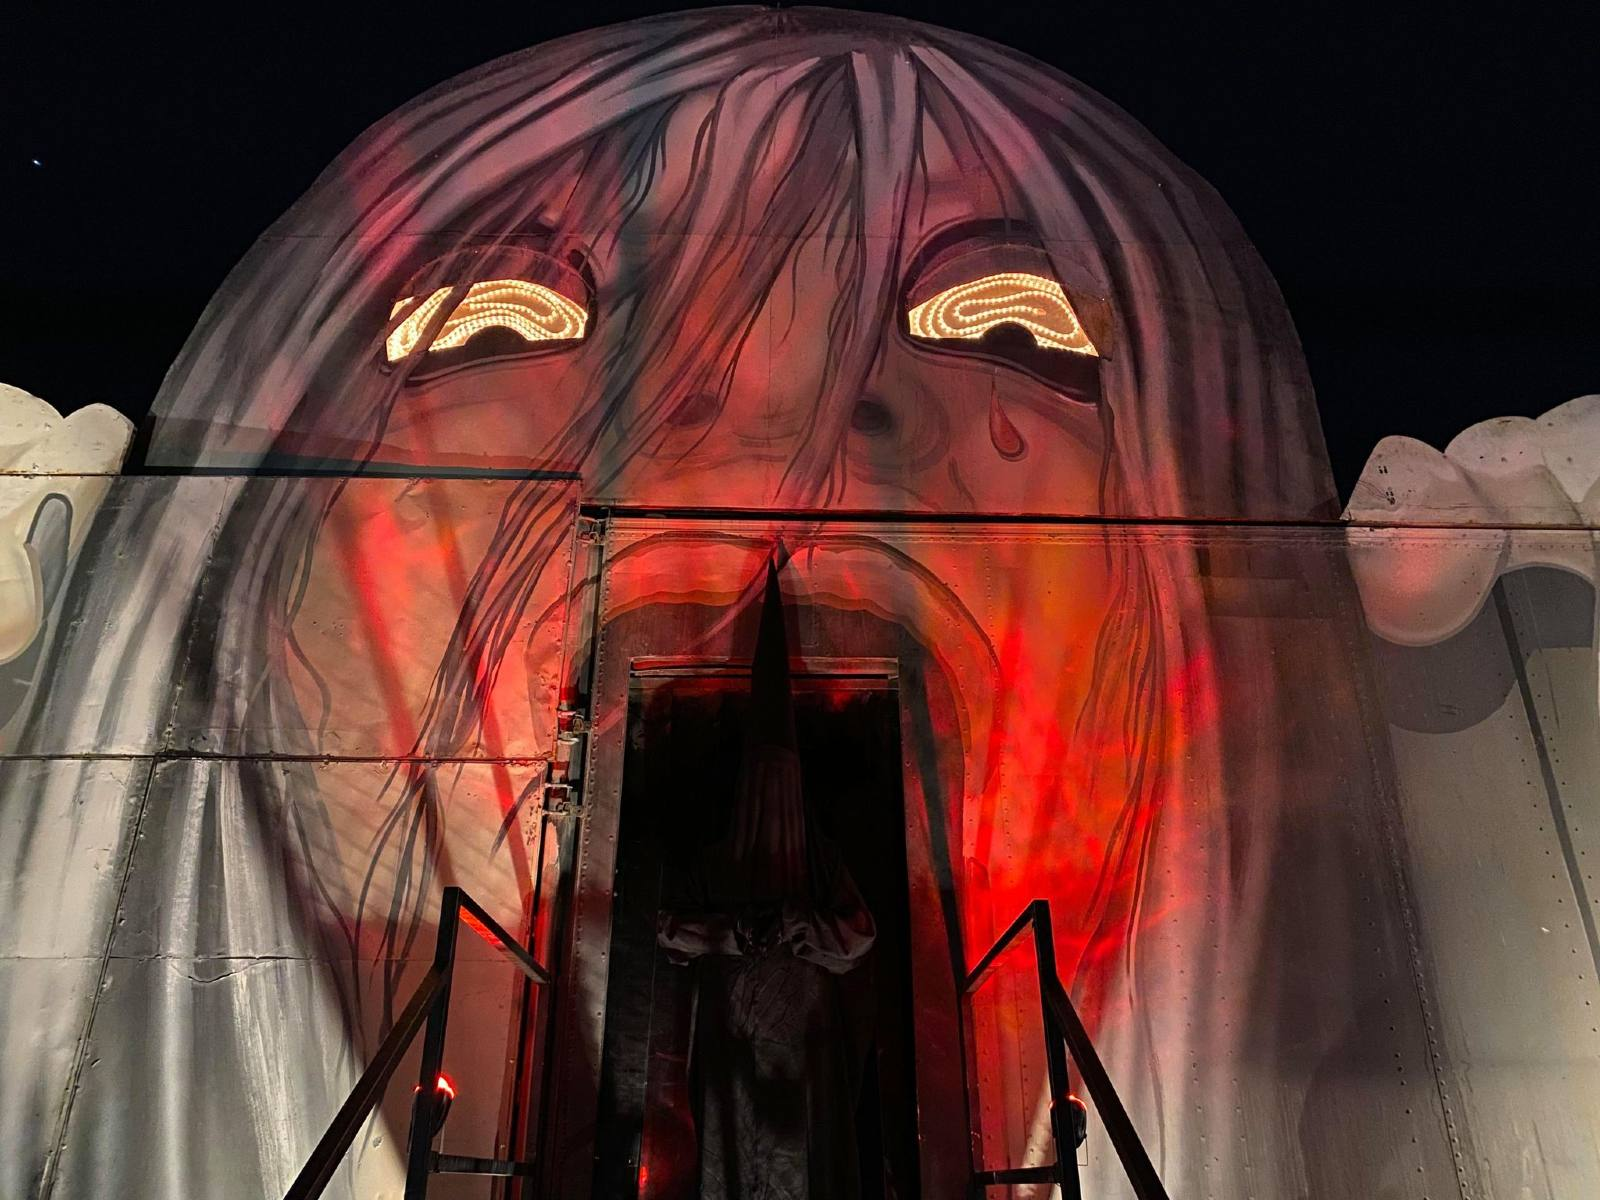 Freakling Bros Horror Shows - The Return - Castle Vampyre - Coven 13 - Gates of Hell - Haunted House - Las Vegas - CA - Freakling Bros' The Men's Room